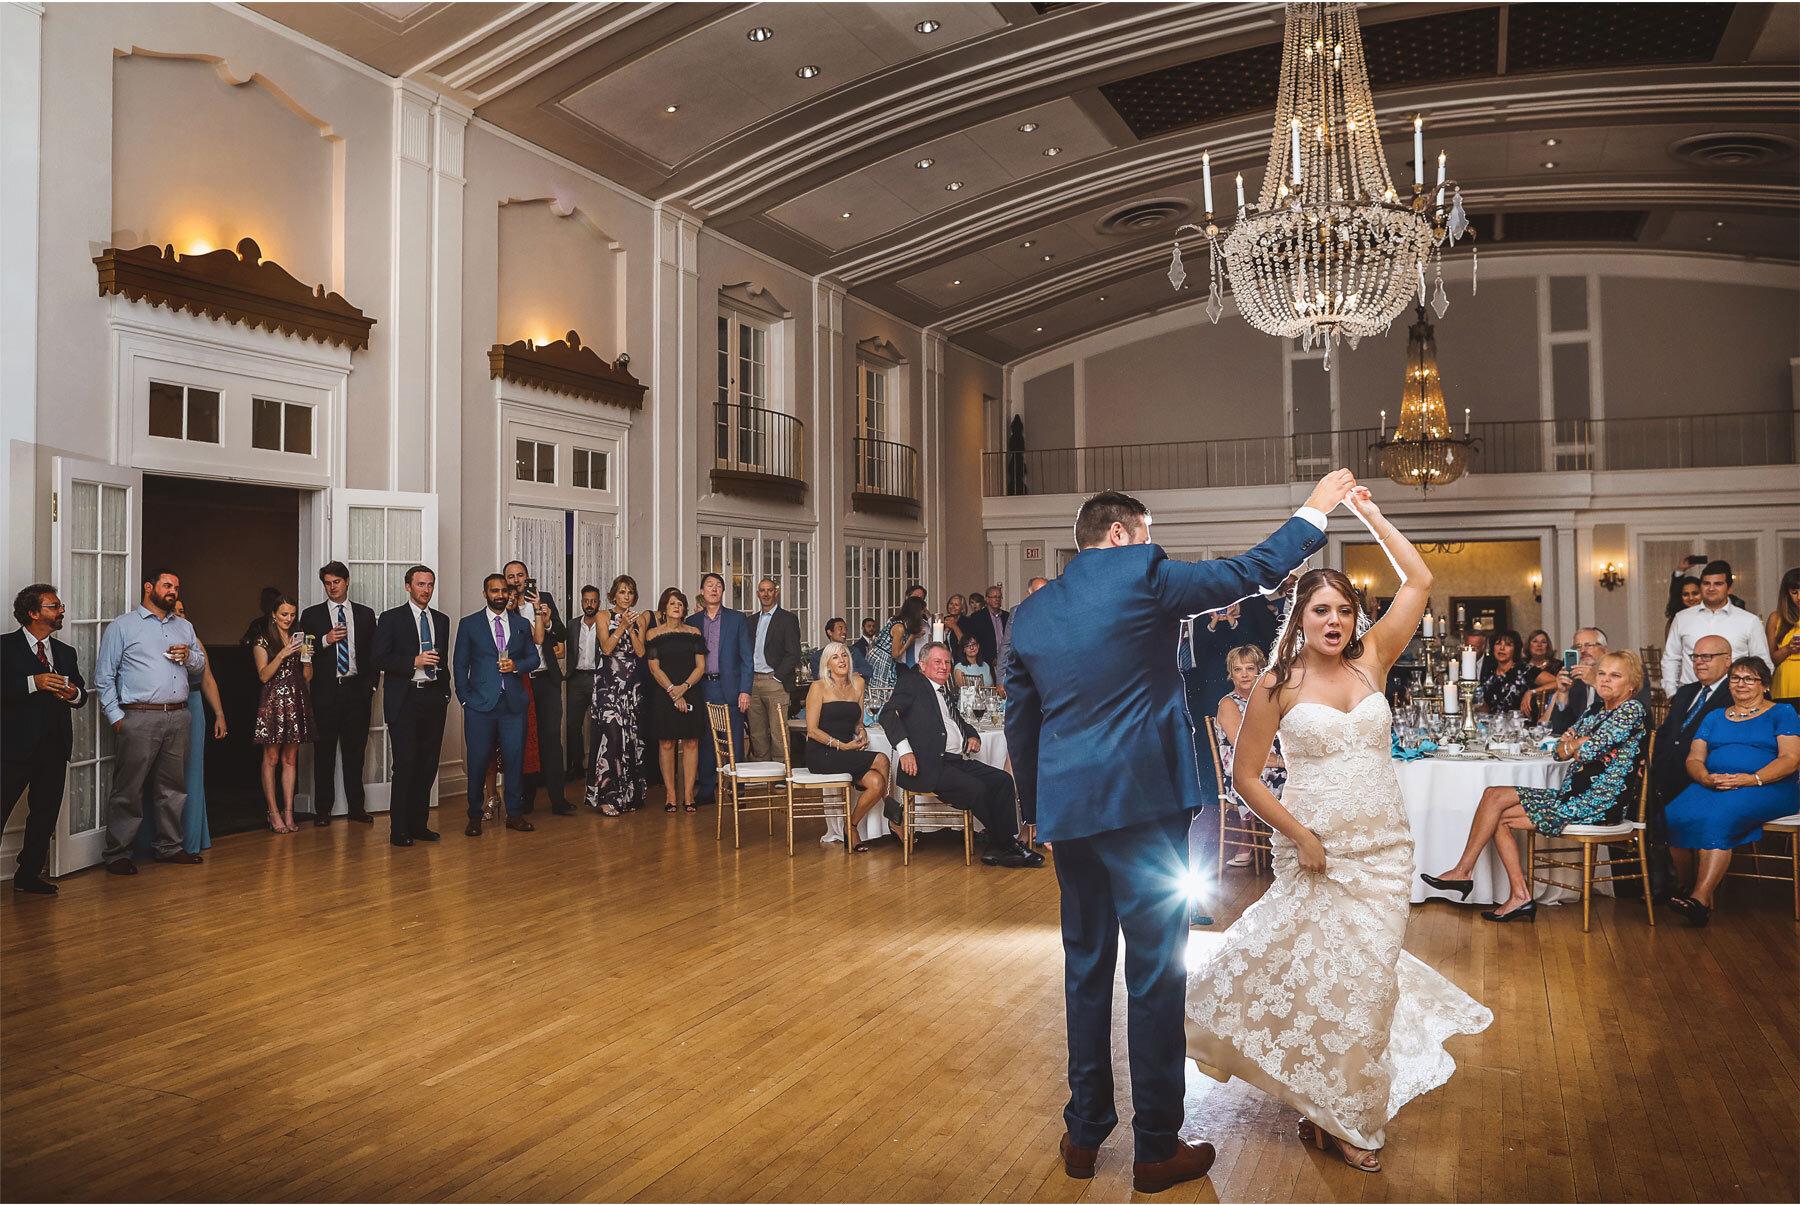 19-Vick-Photography-Wedding-Minnetonka-Minnesota-Lafayette-Club-Reception-First-Dance-Katie-and-David.jpg